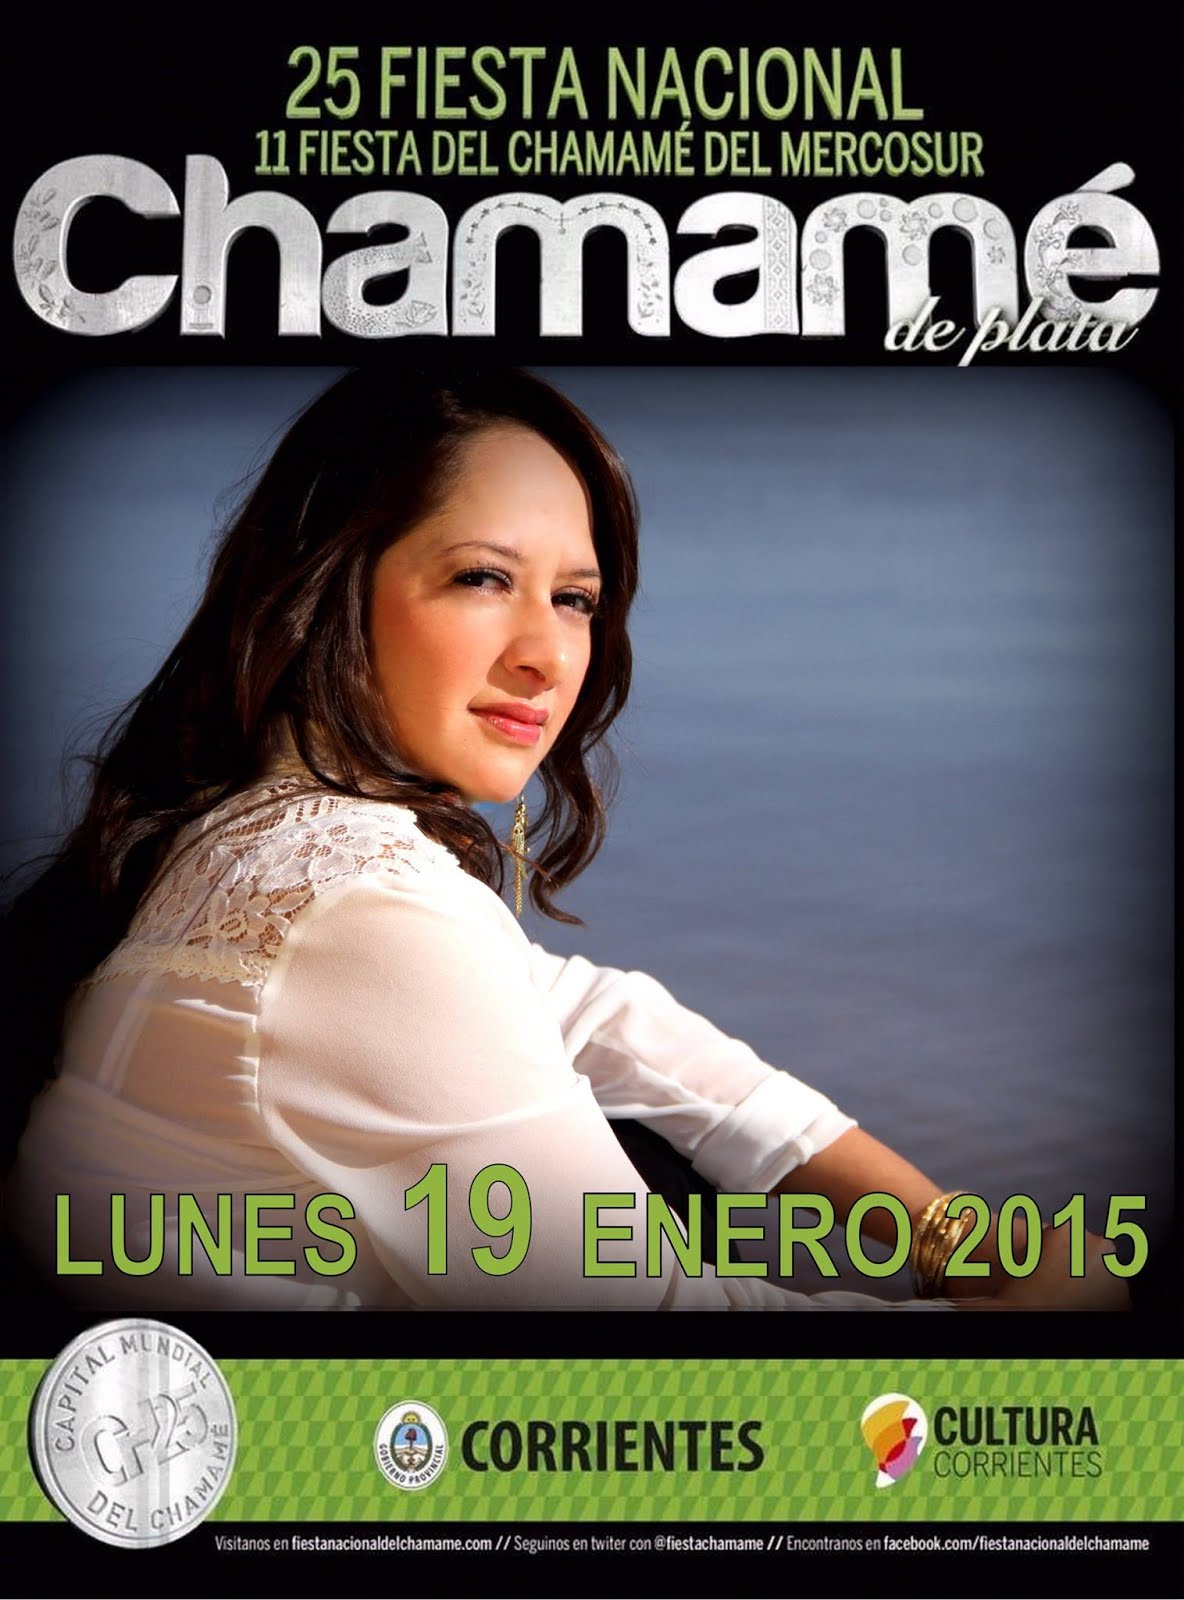 25 Fiesta Nacional del Chamame